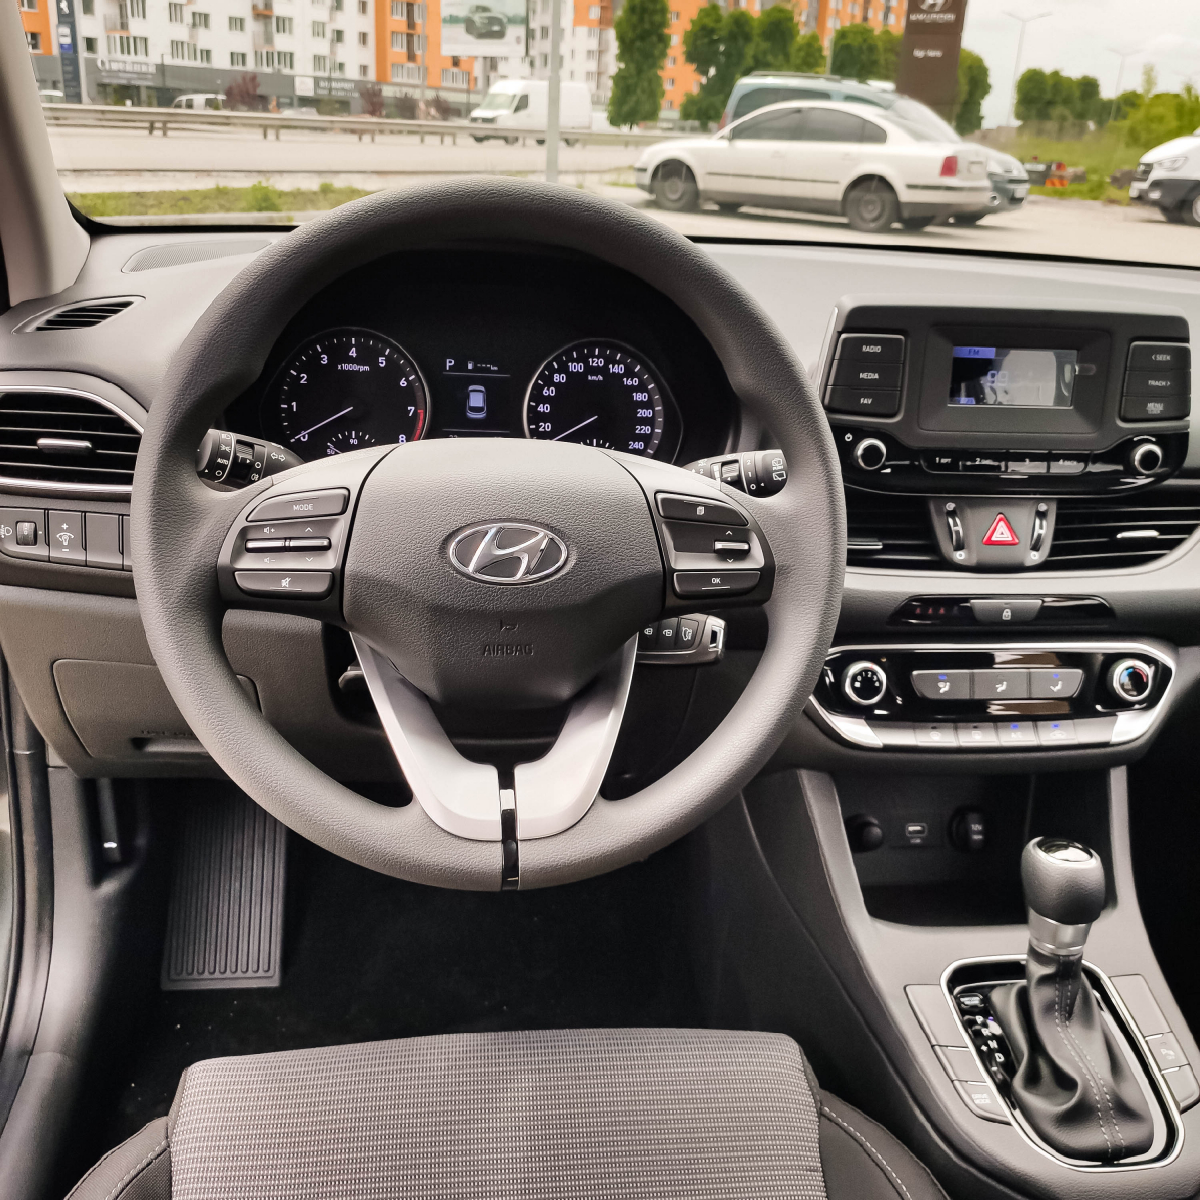 Спеціальна вигода на придбання Hyundai i30 WGN!   Хюндай Мотор Україна - фото 11